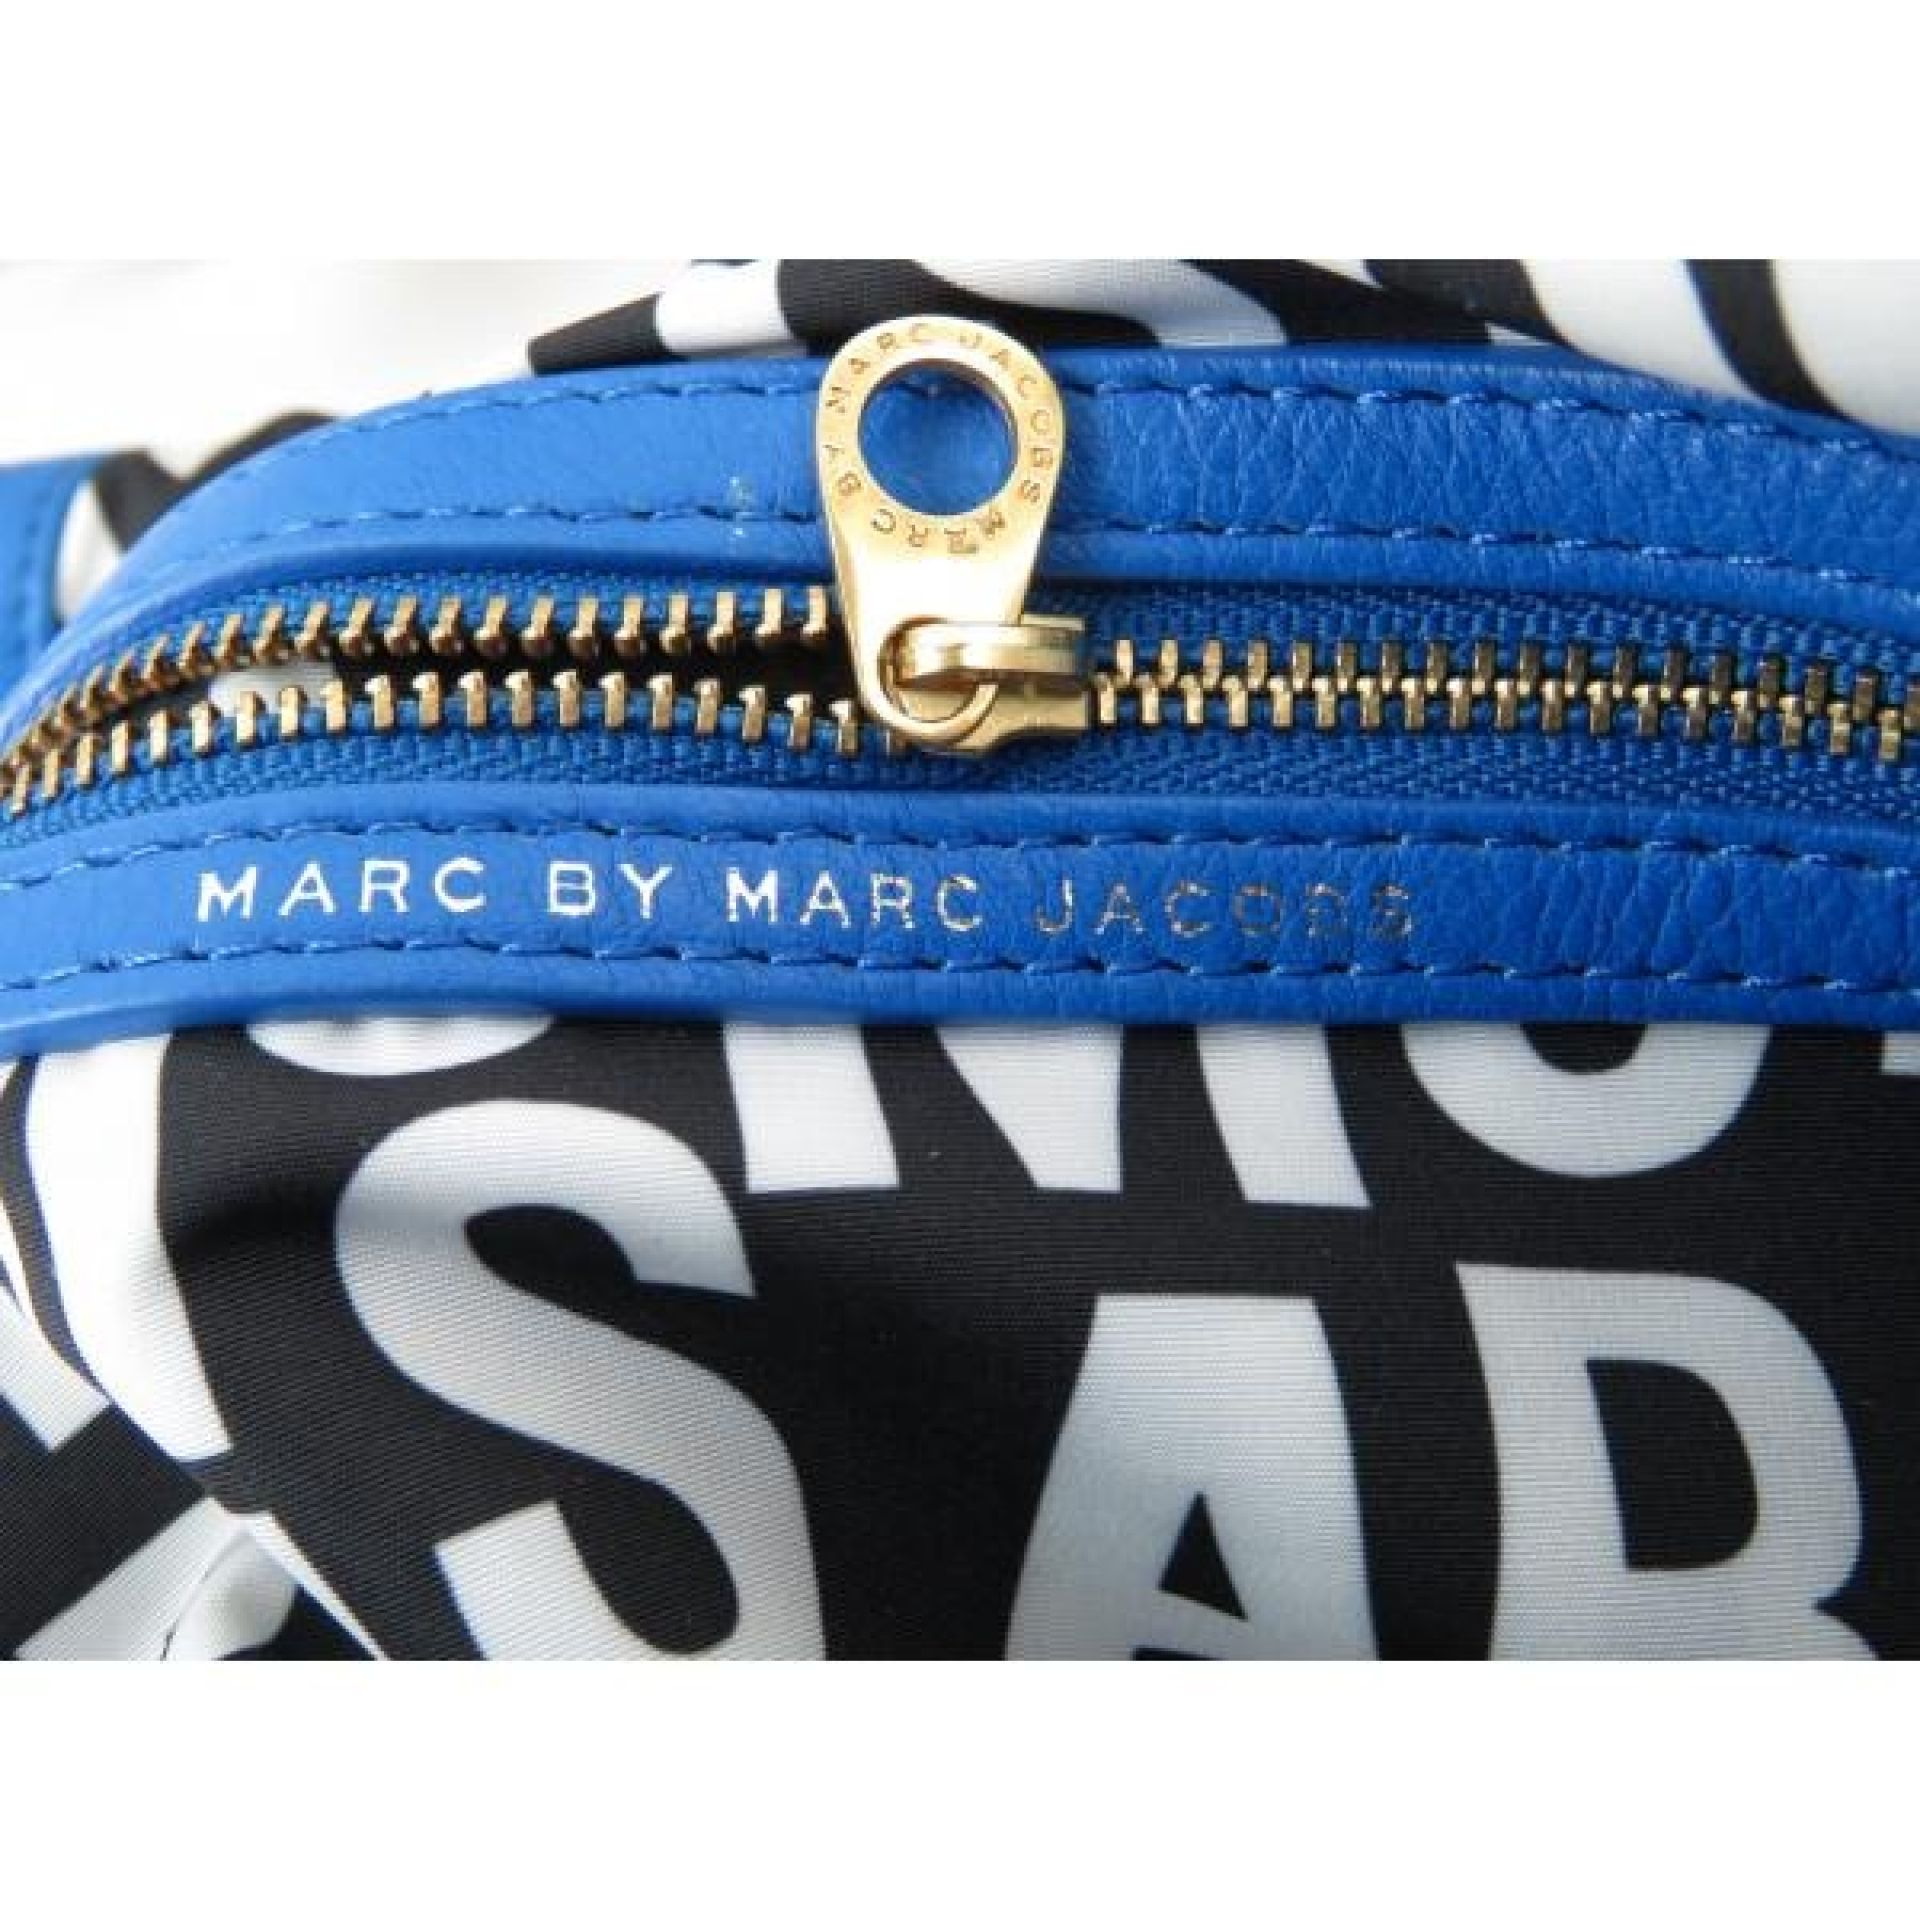 Marc by Marc Jacobs Blue Leather Classic Q Natasha Crossbody Bag